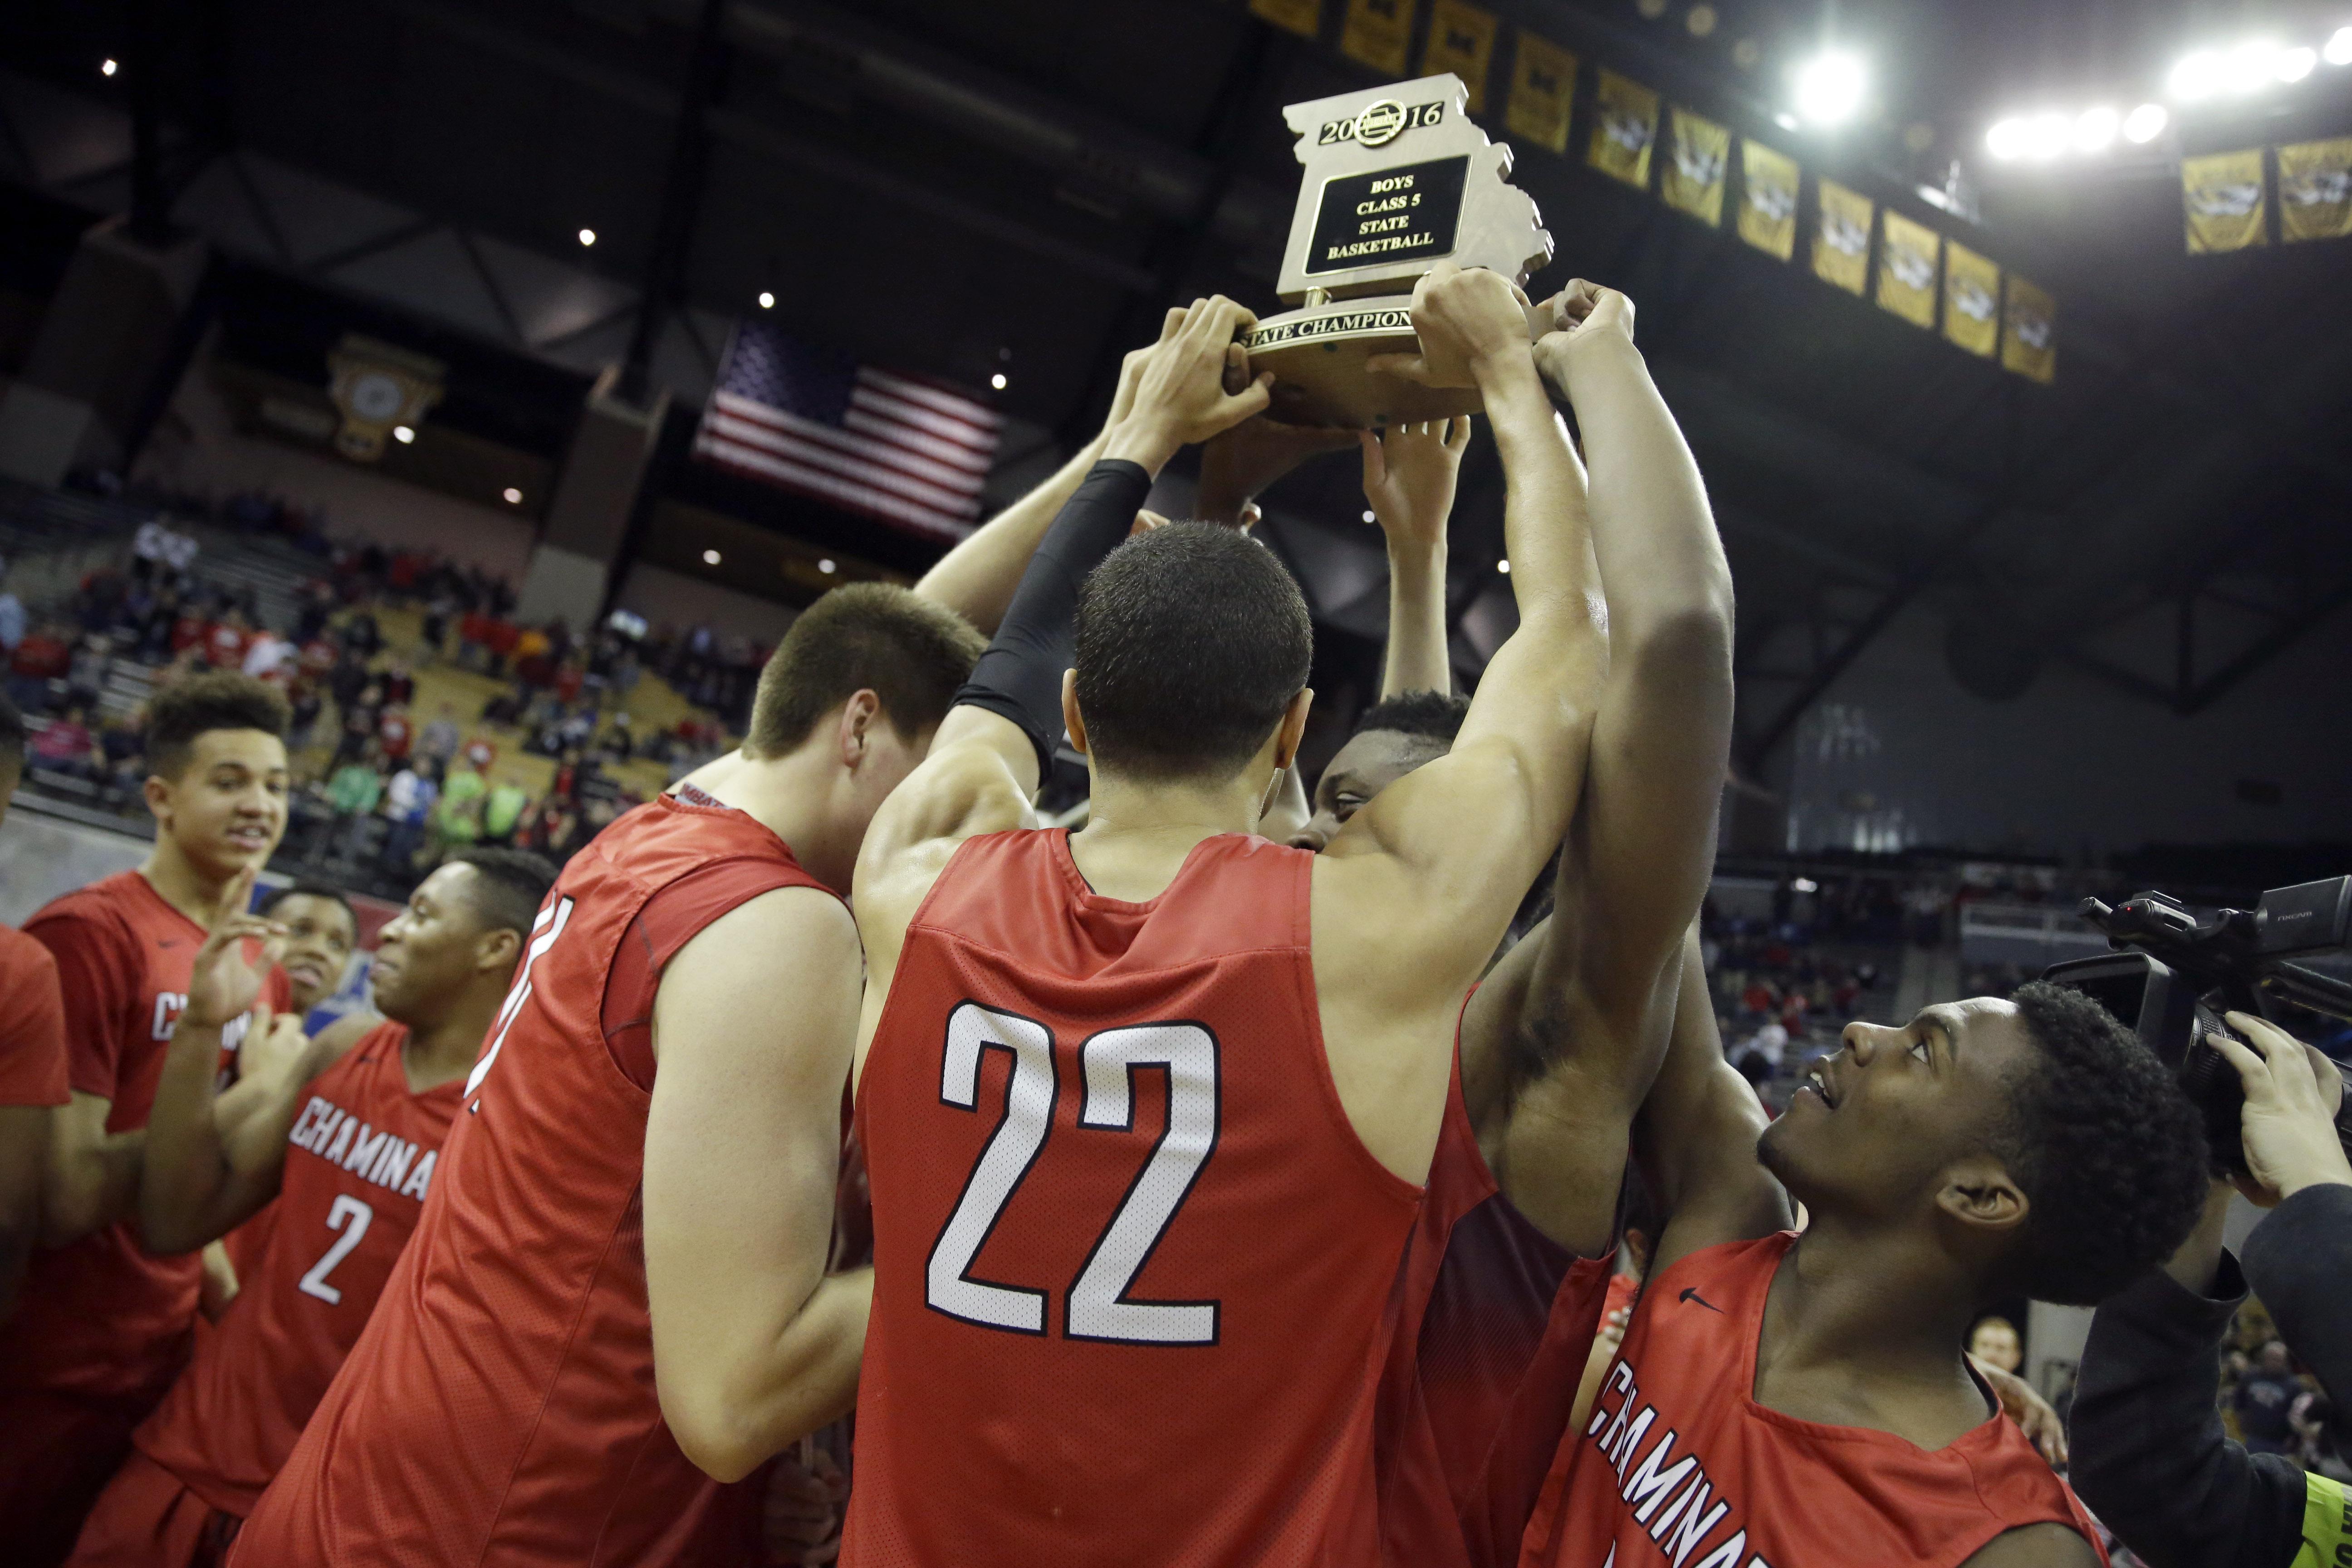 Chaminade celebrates following the Missouri Class 5 boys high school championship basketball game against Kickapoo (Photo: Jeff Roberson), Associated Press)